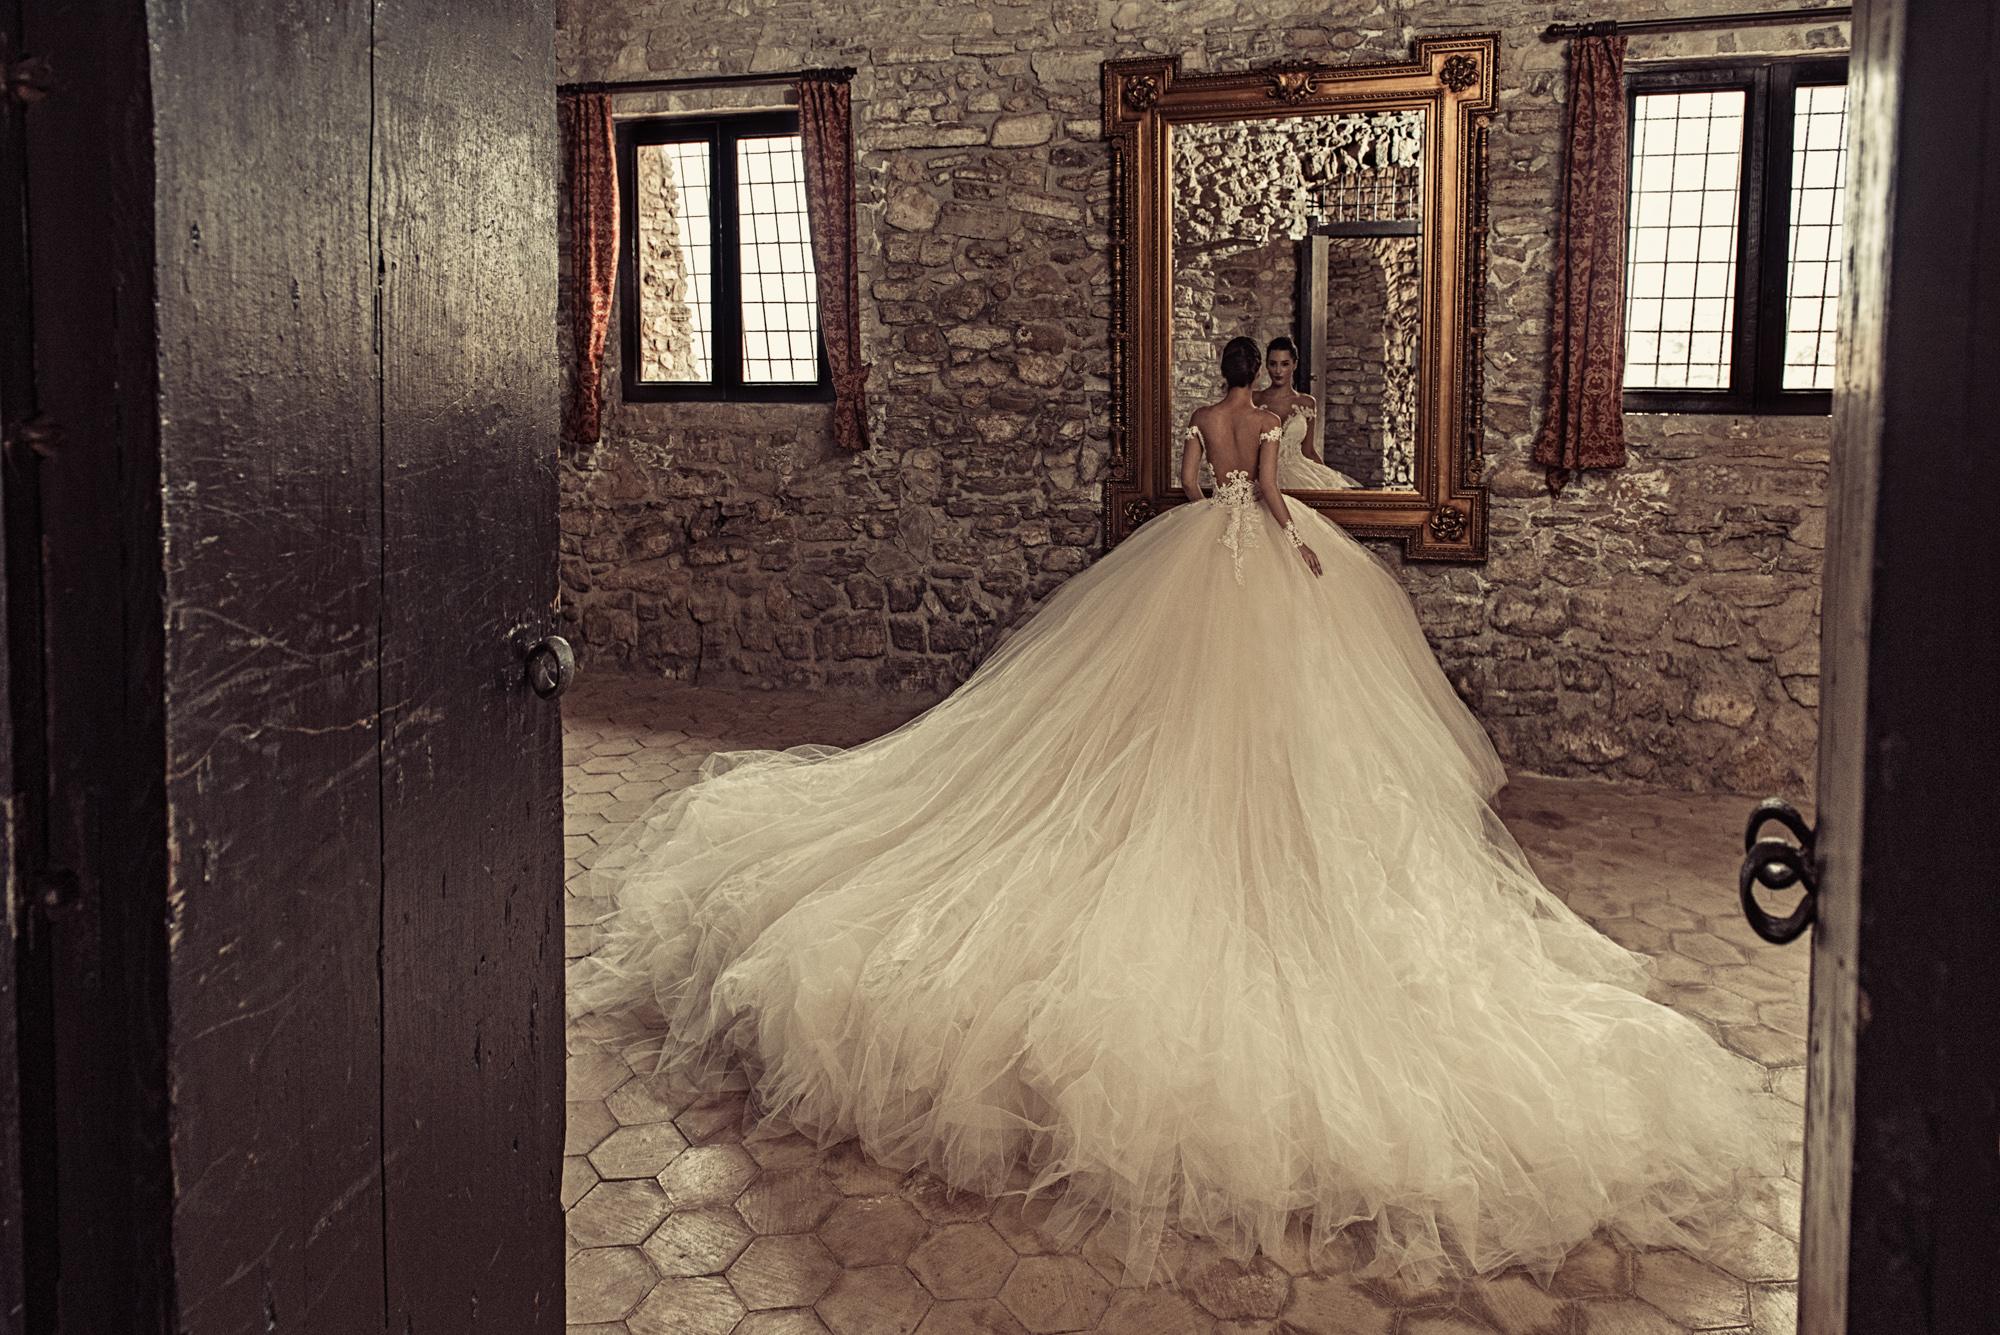 b87cee20e1af8 Bellasposa Bridal & Photography